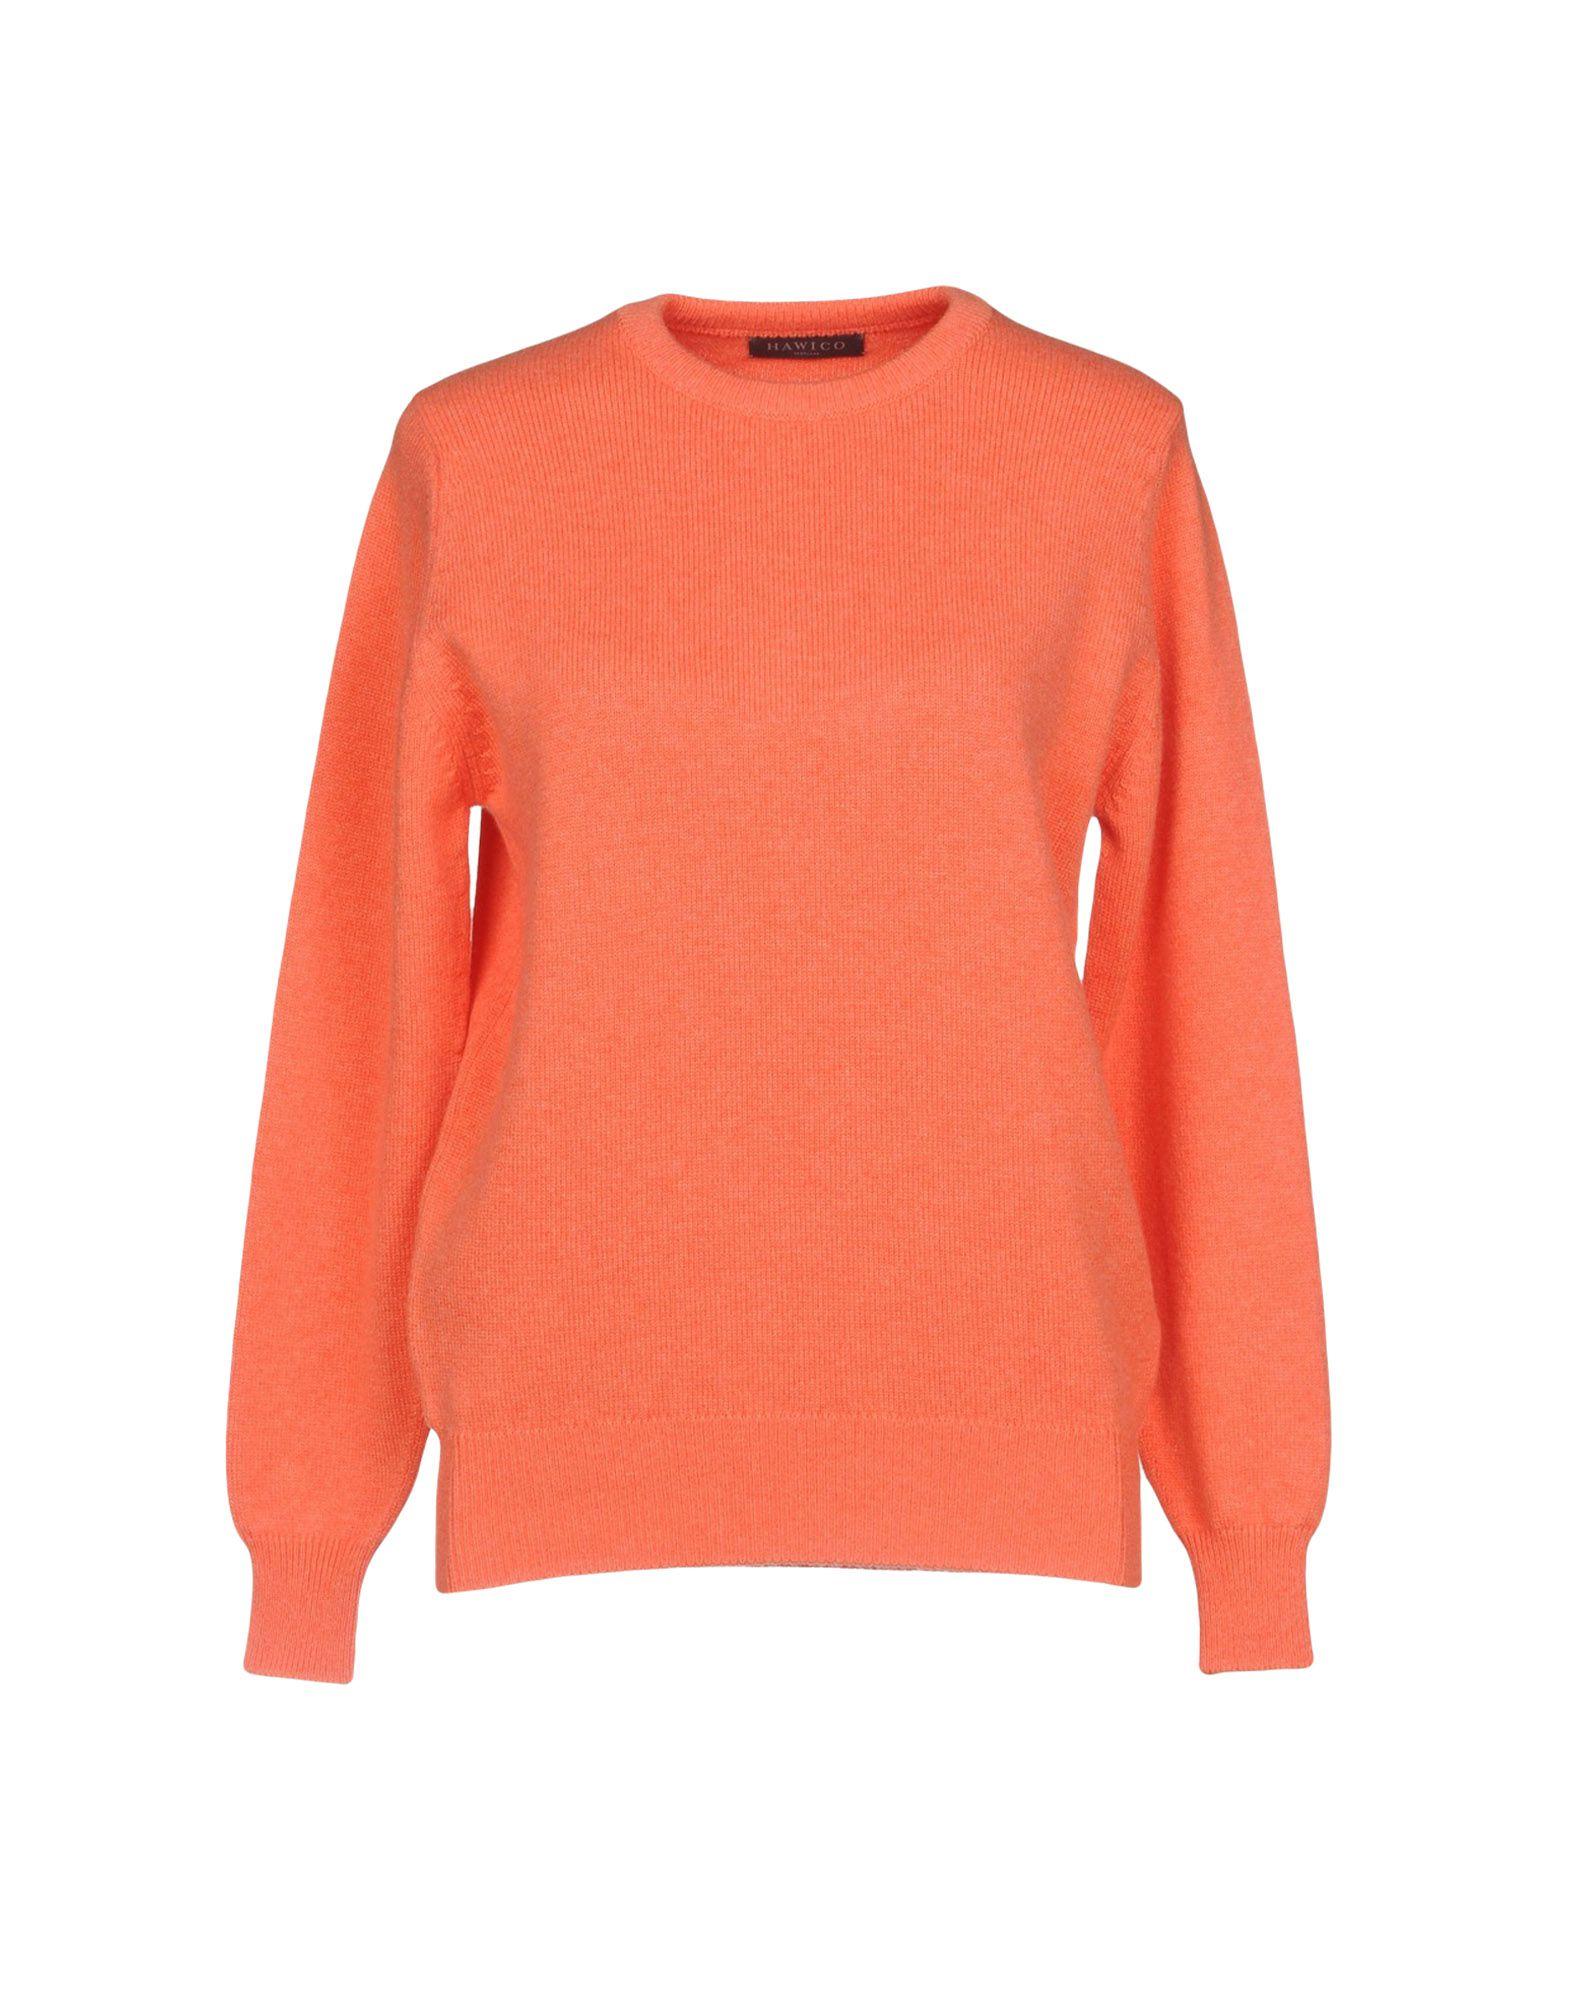 HAWICO Cashmere Blend in Orange